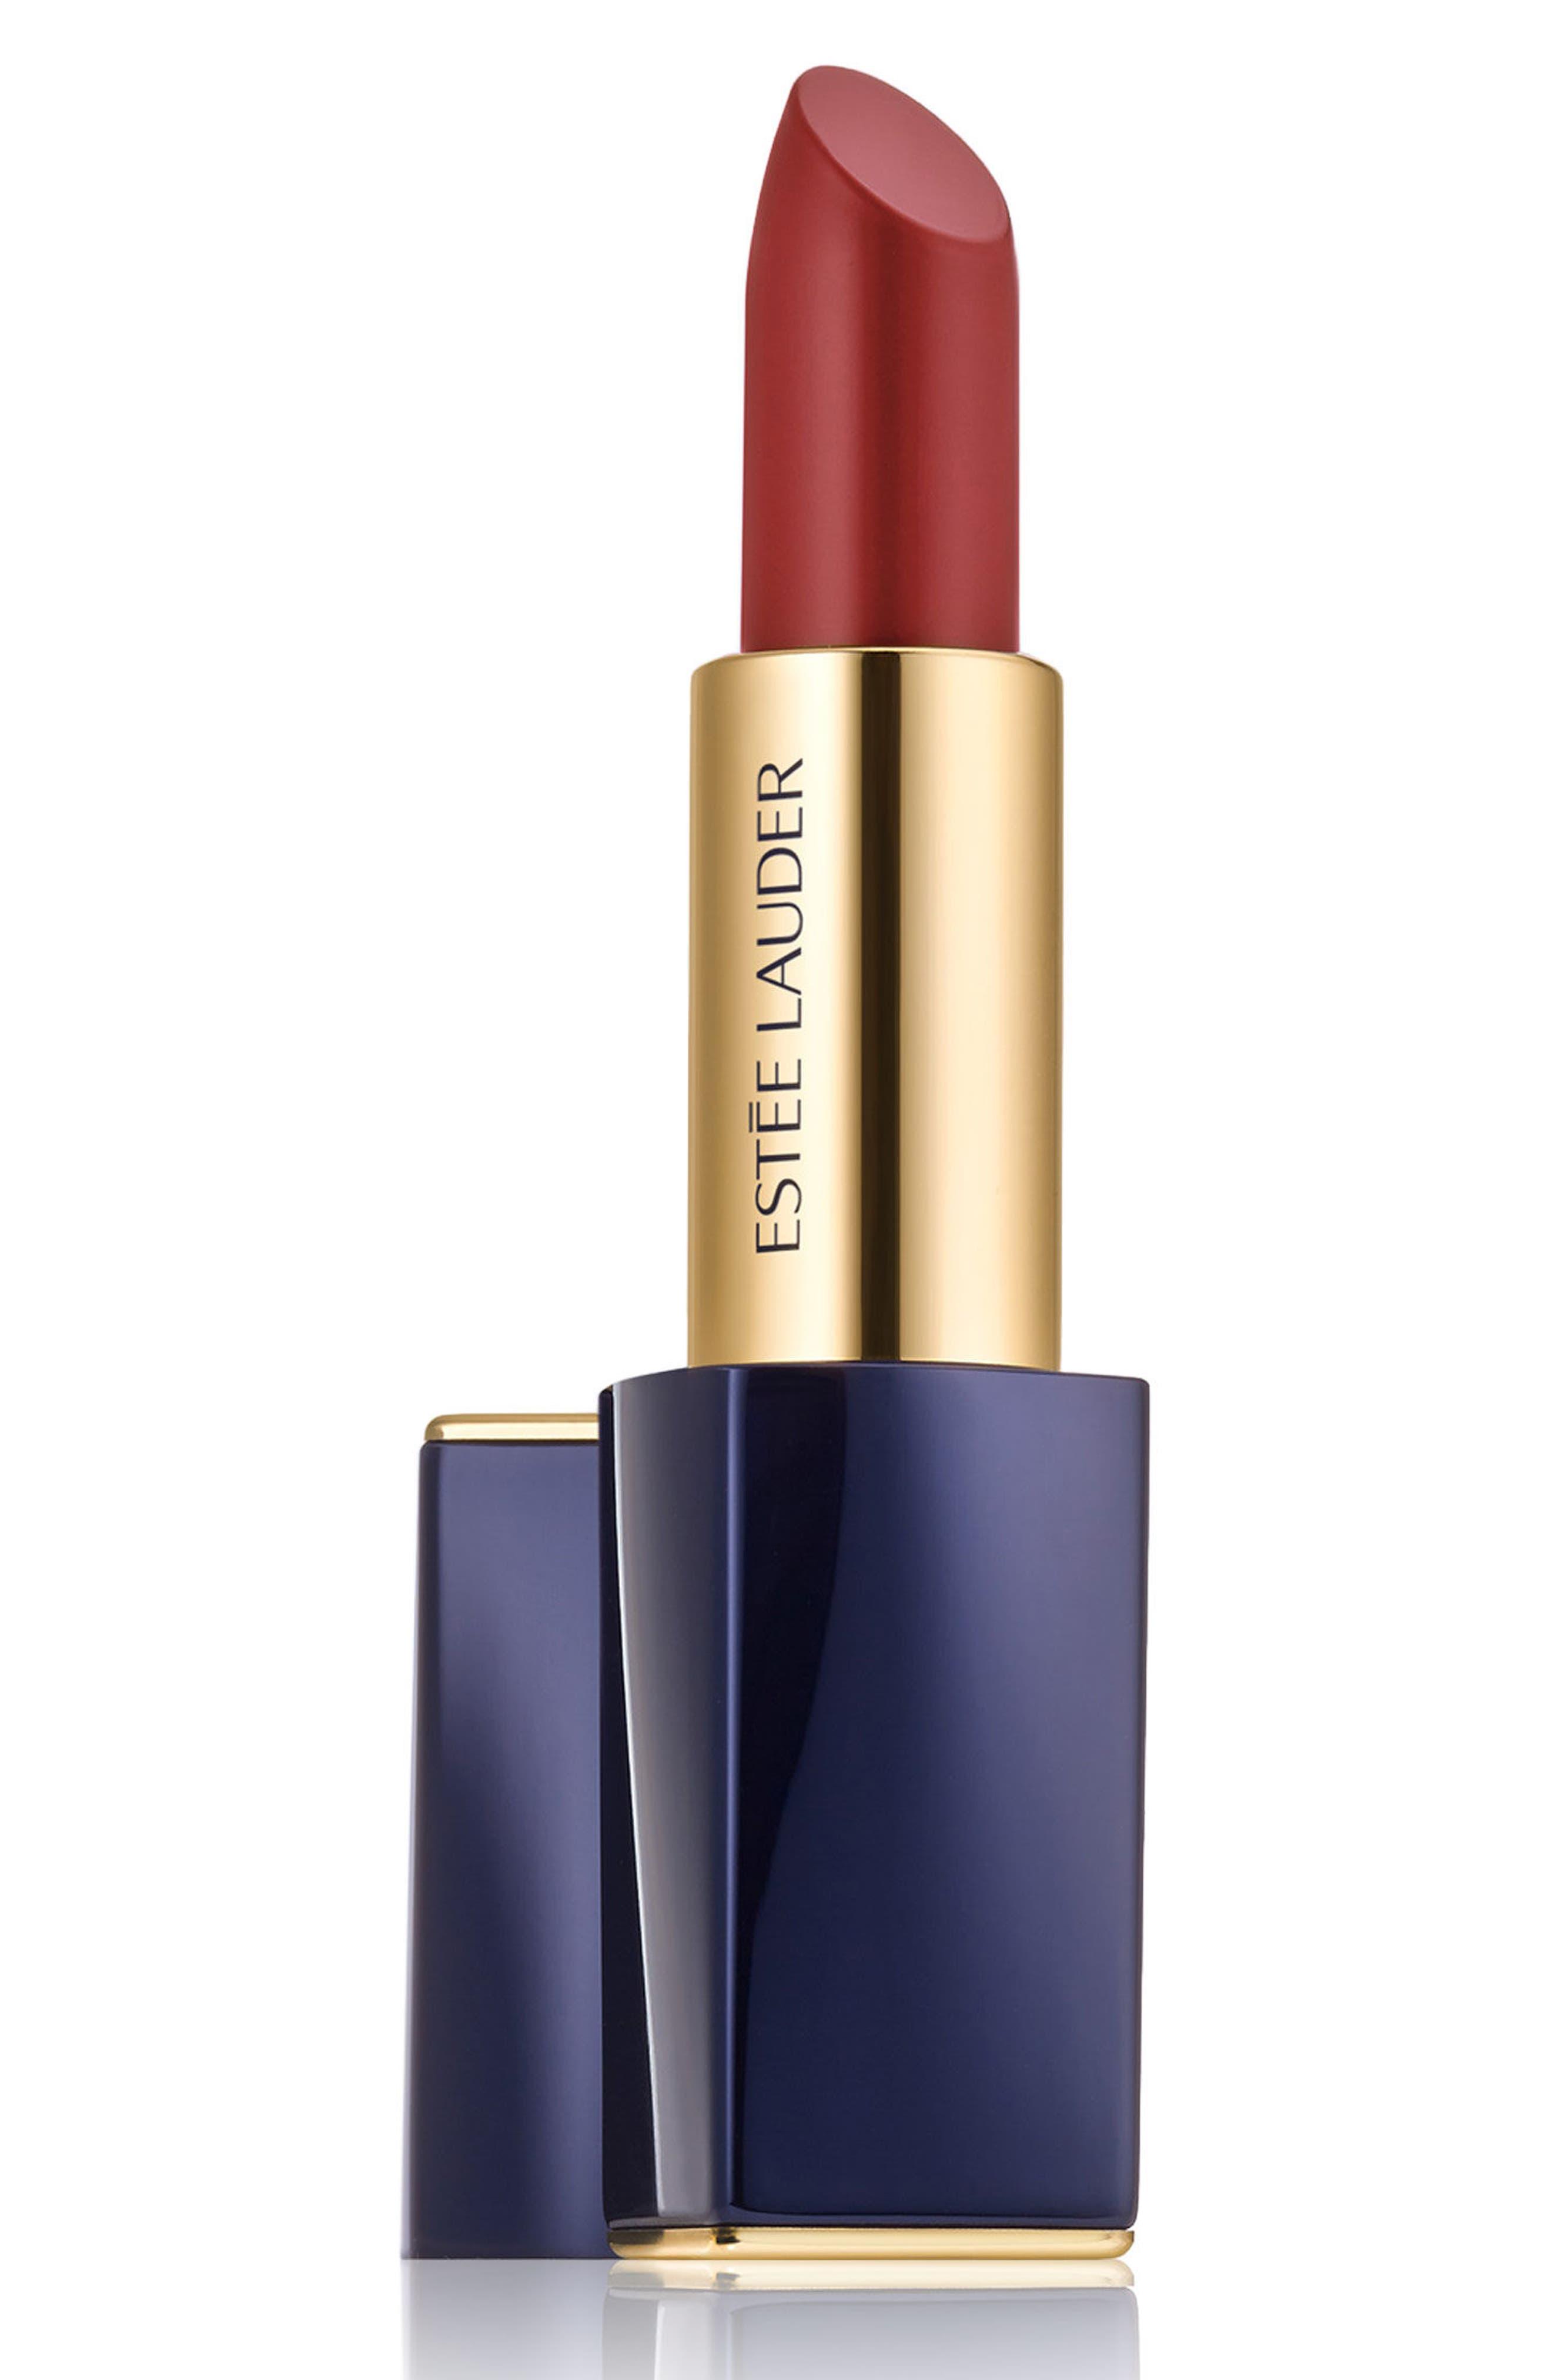 Pure Color Envy Matte Sculpting Lipstick,                         Main,                         color, 113 RAW EDGE